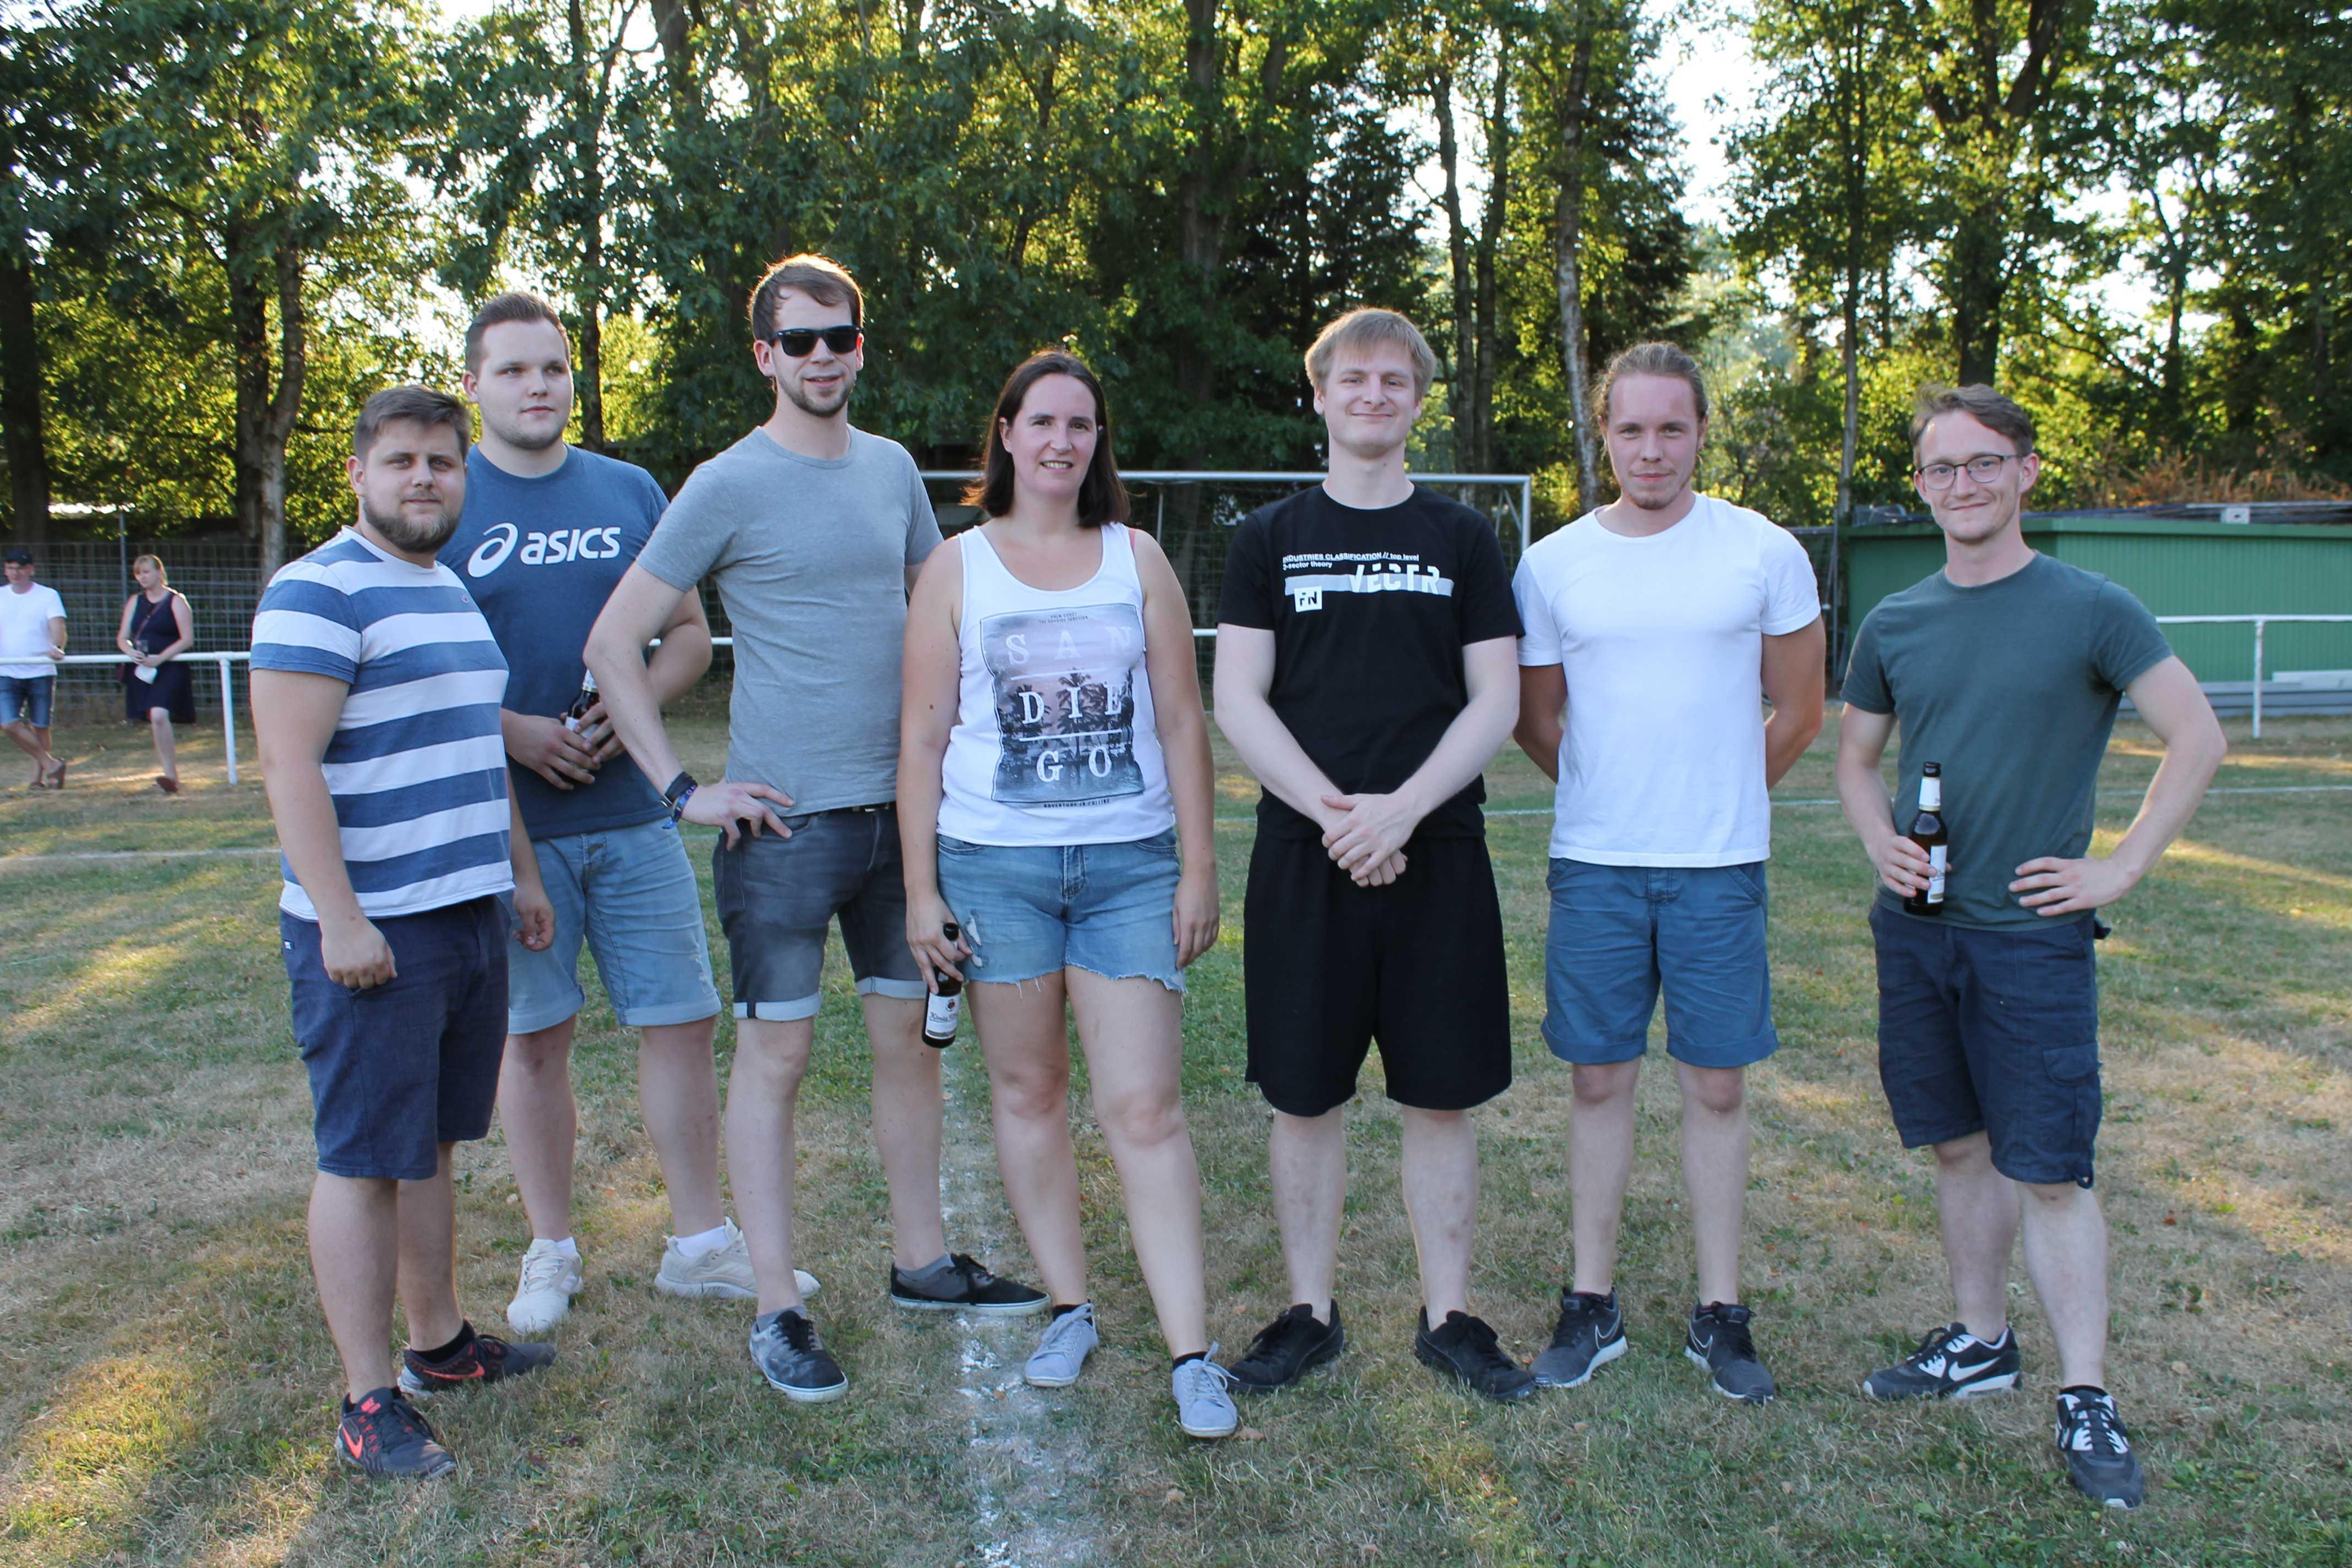 2018-07-27 Sportwoche - Flunkyball Turnier (22)